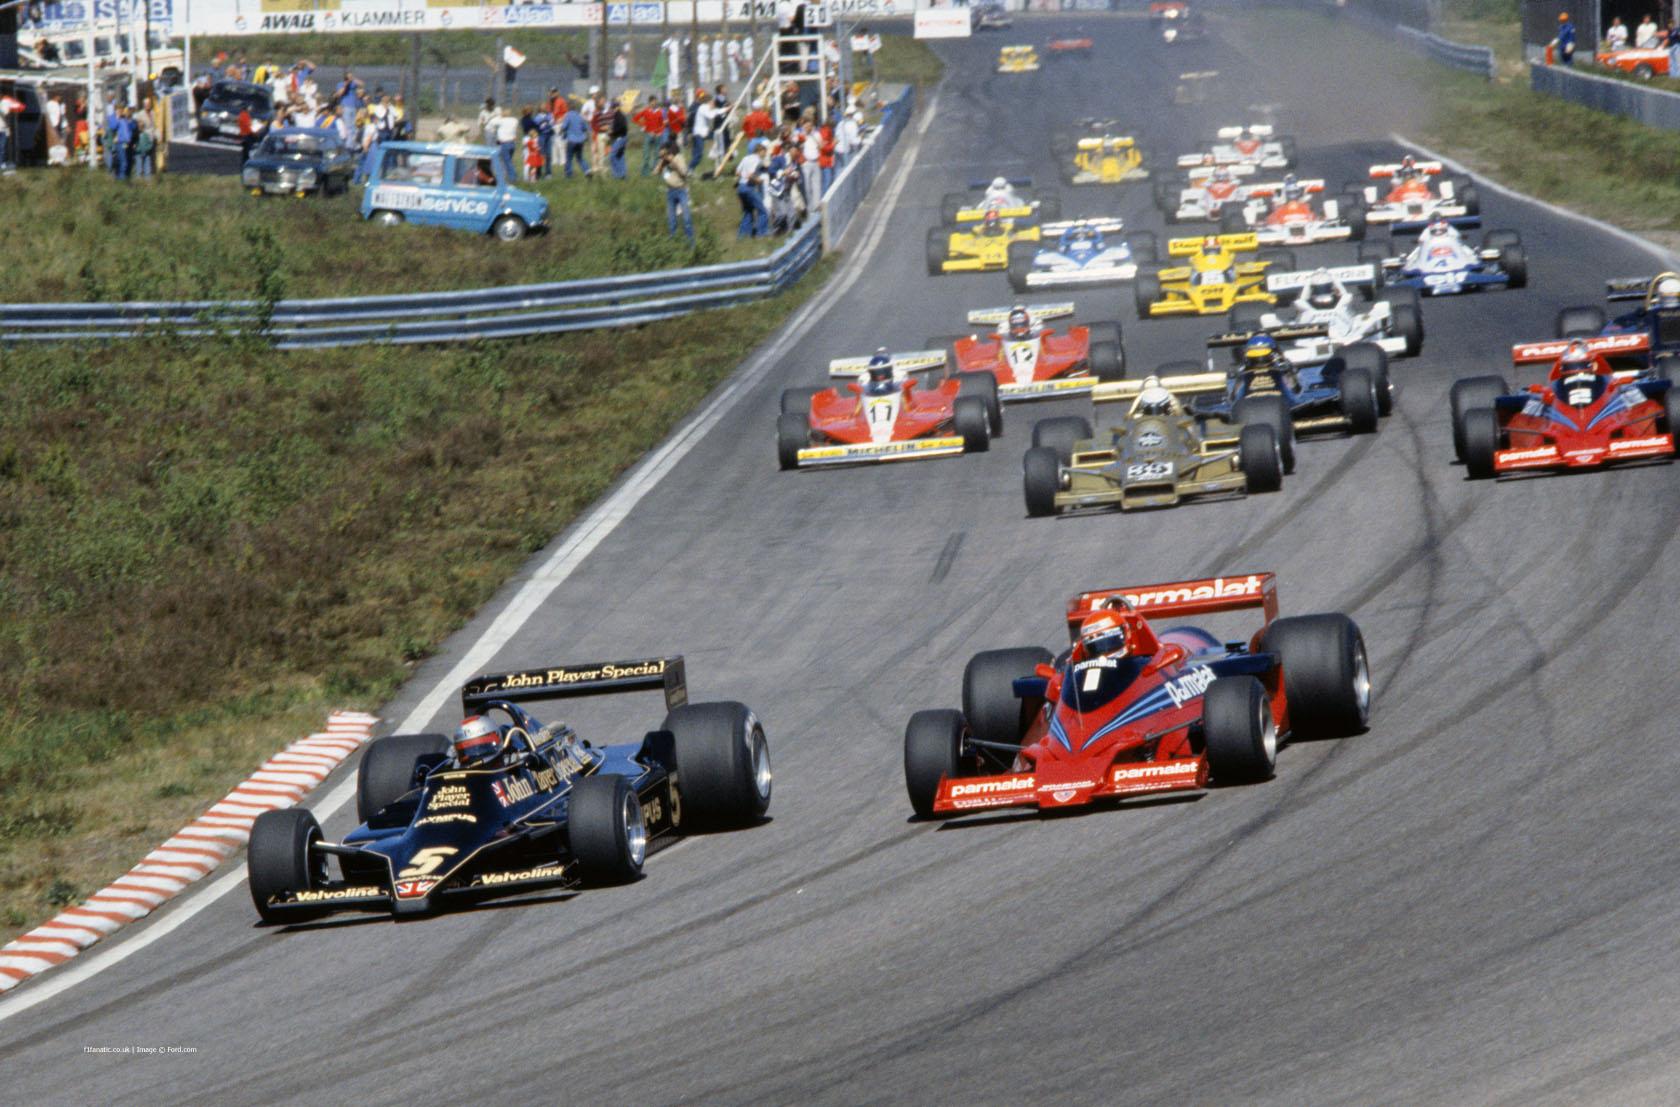 Start of the 1978 Swedish Grand Prix. Niki Lauda immediately pounces on Mario Andretti.